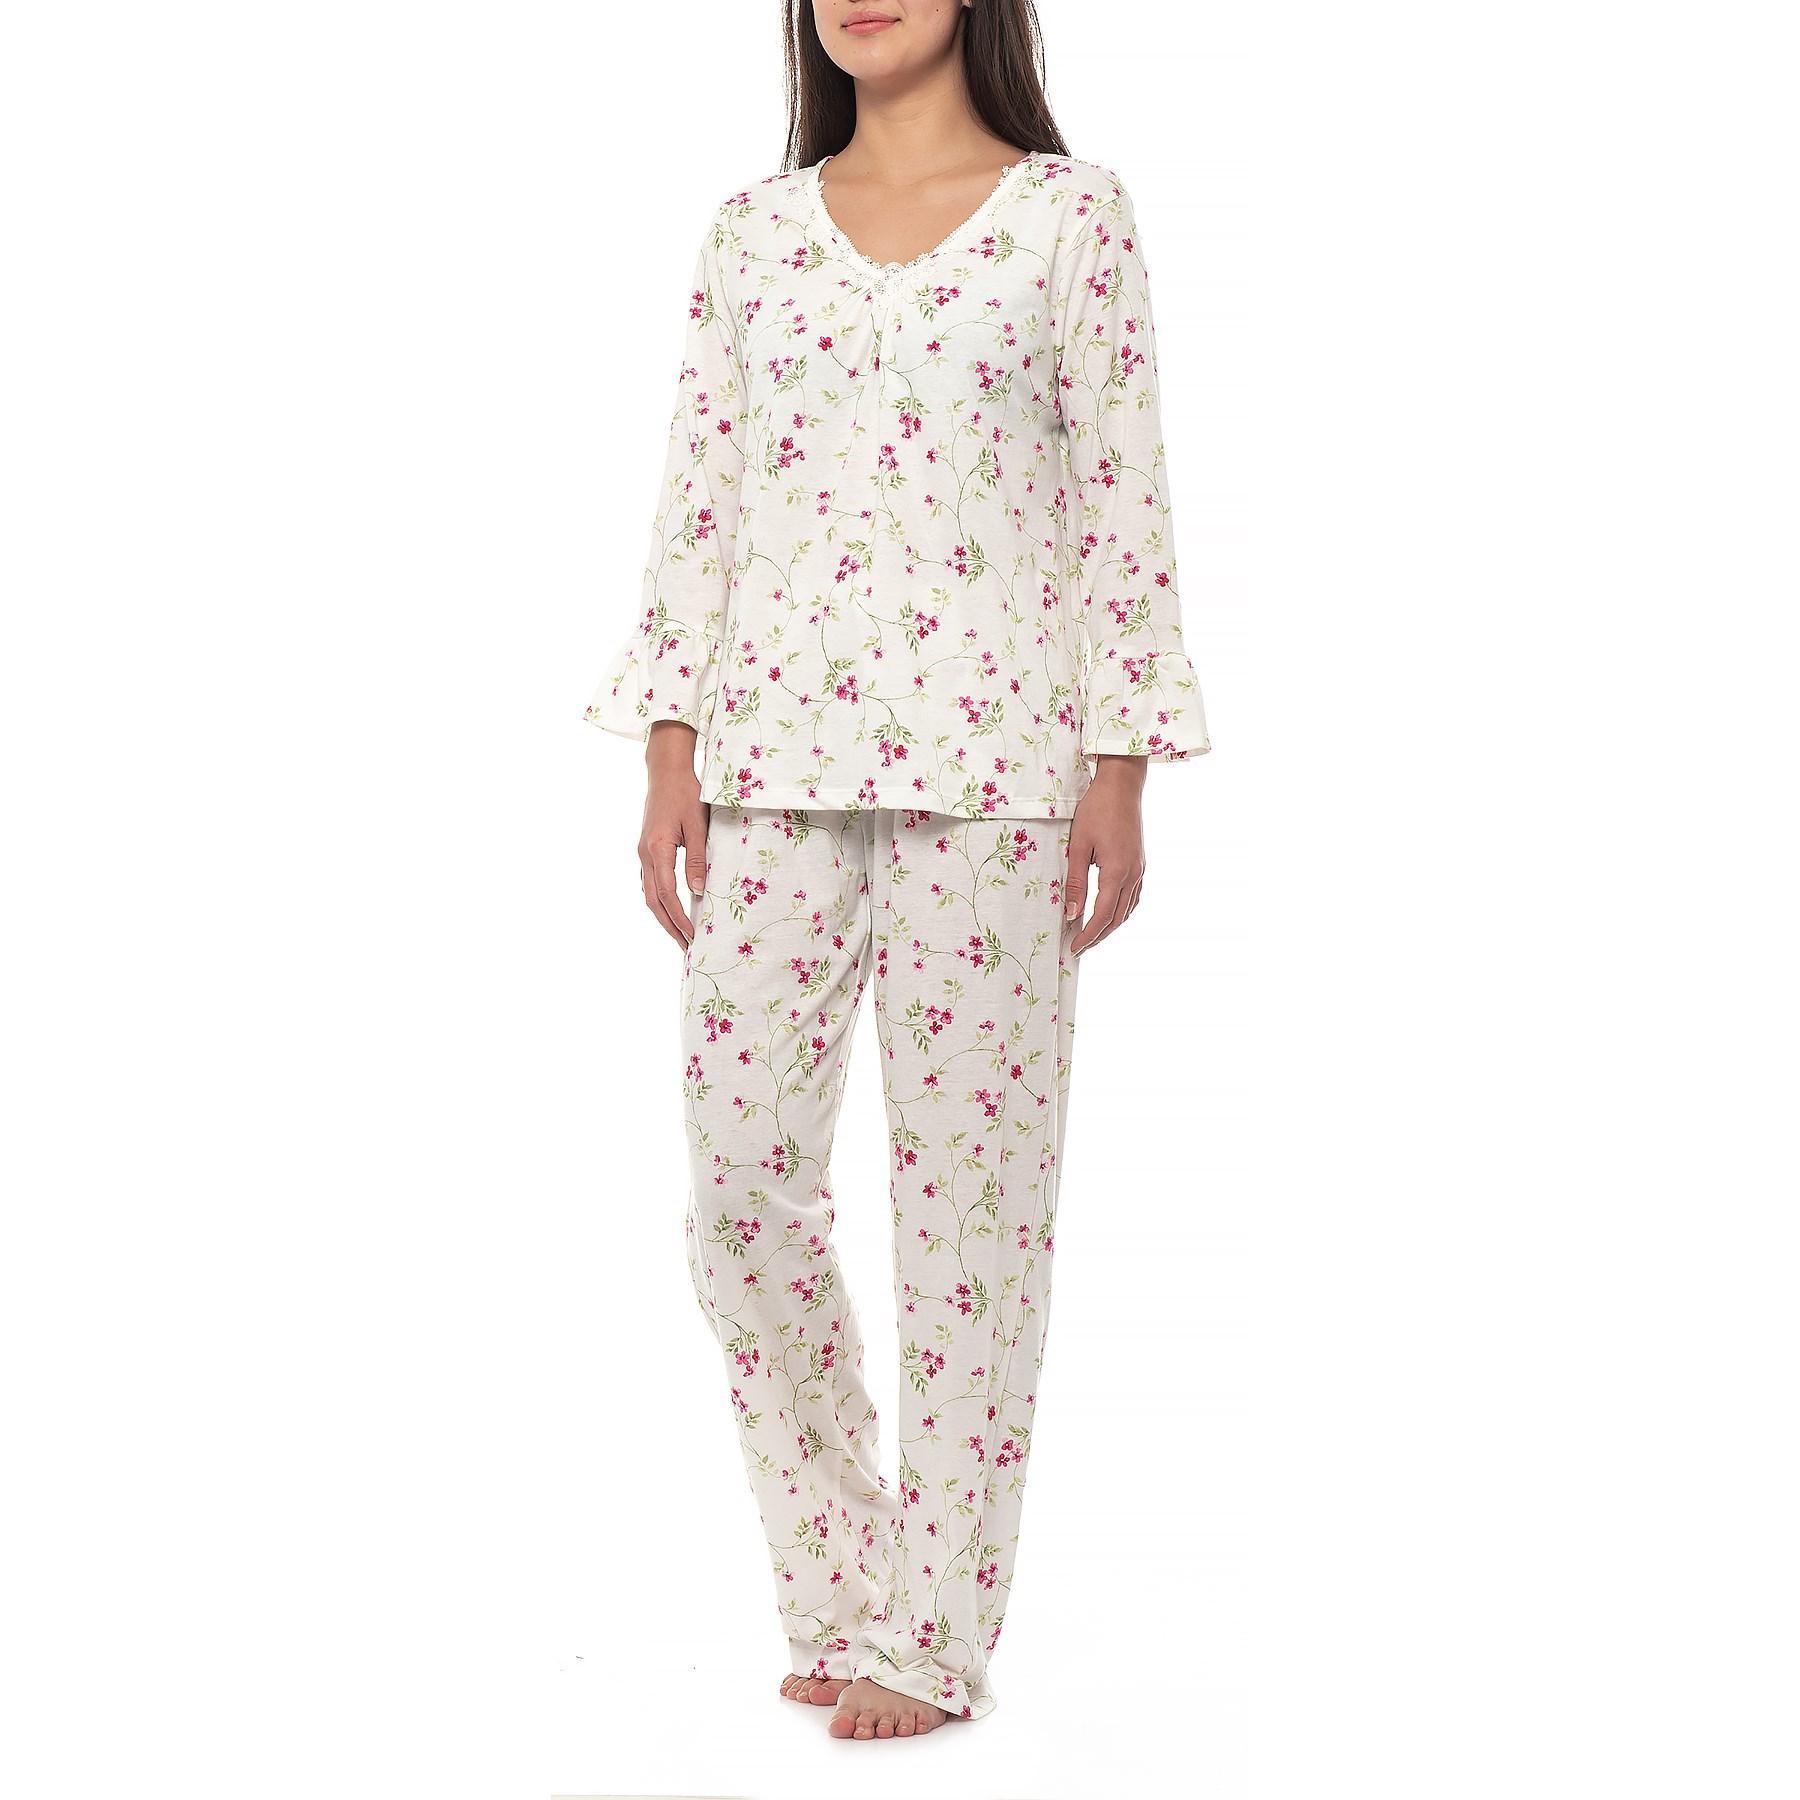 f3bf4e7c5e Lyst - Carole Hochman Brushed Jersey Pajamas in White